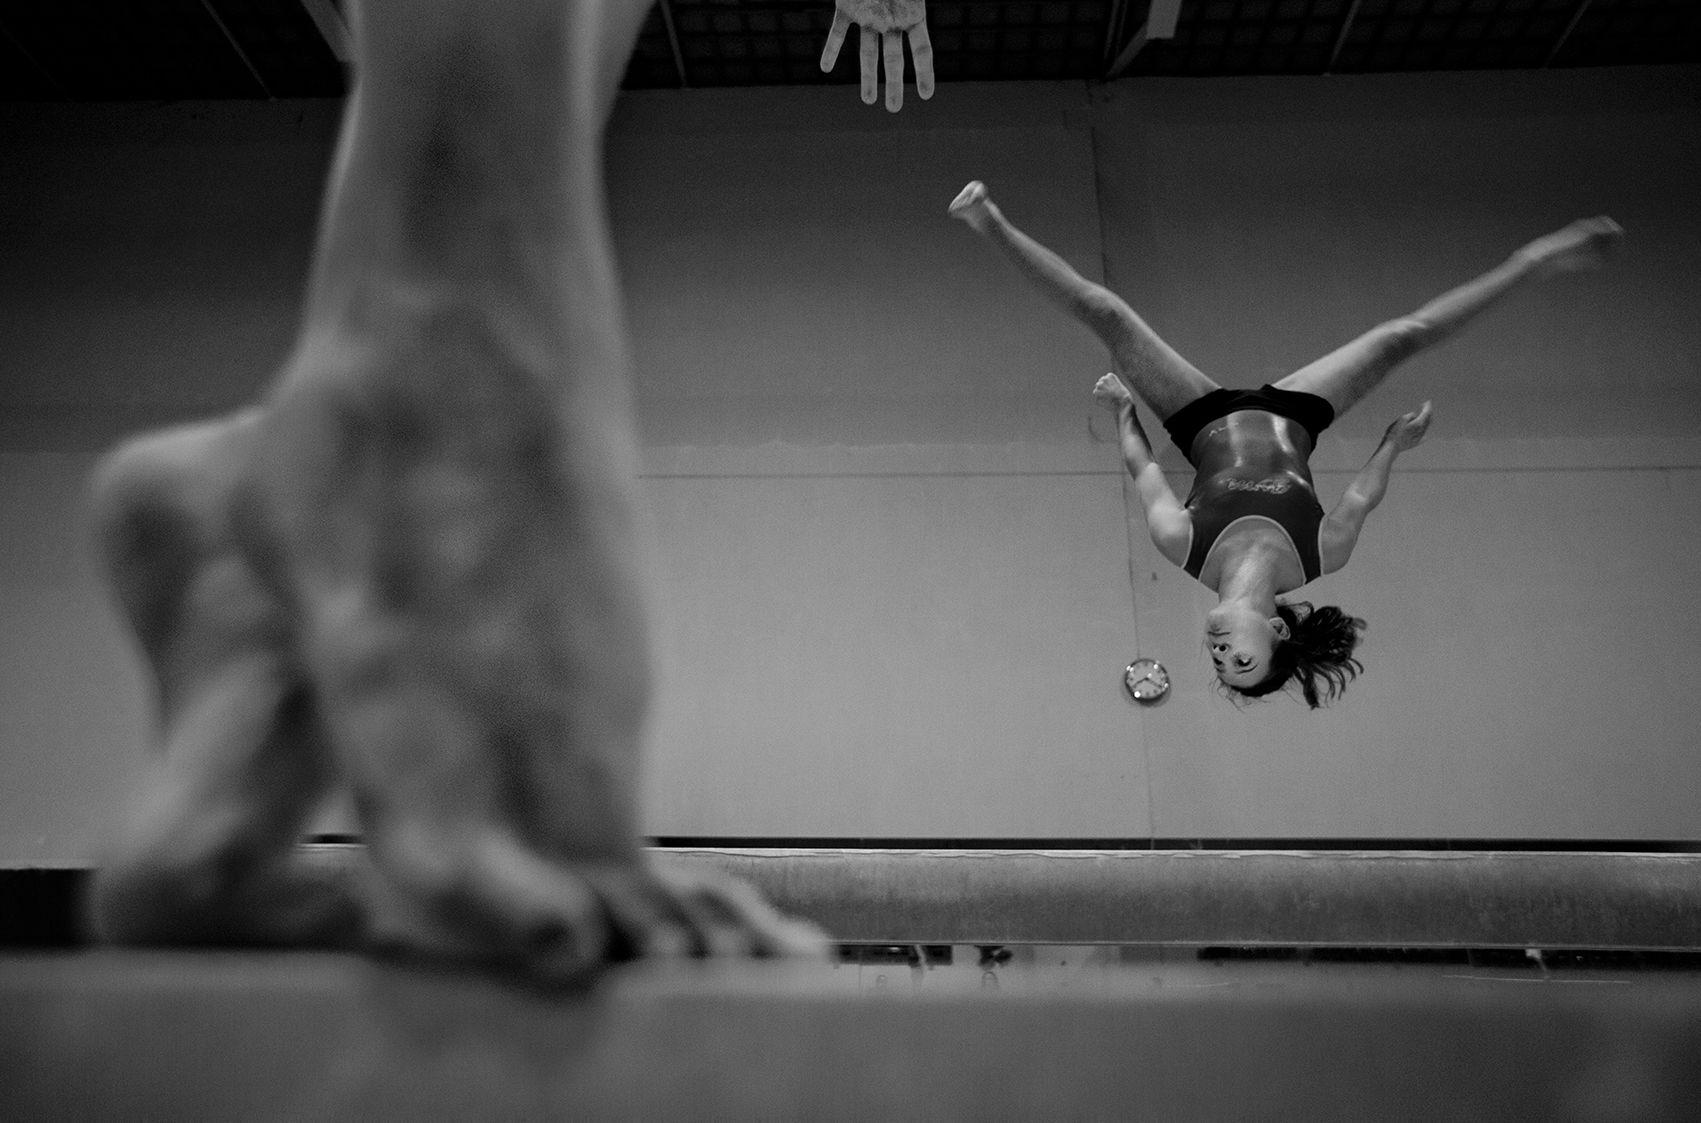 Upside down gymnastic